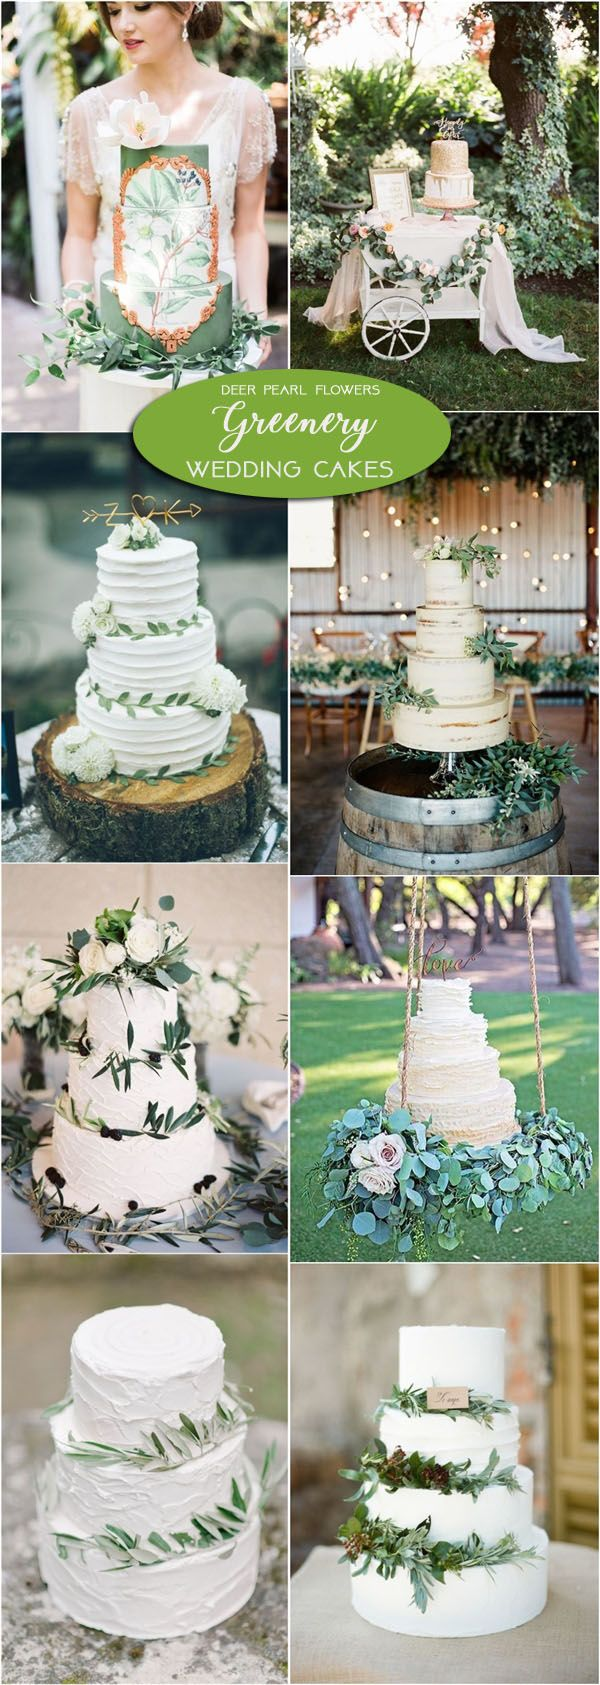 Greenery wedding cake ideas / http://www.deerpearlflowers.com/greenery-wedding-decor-ideas/2/